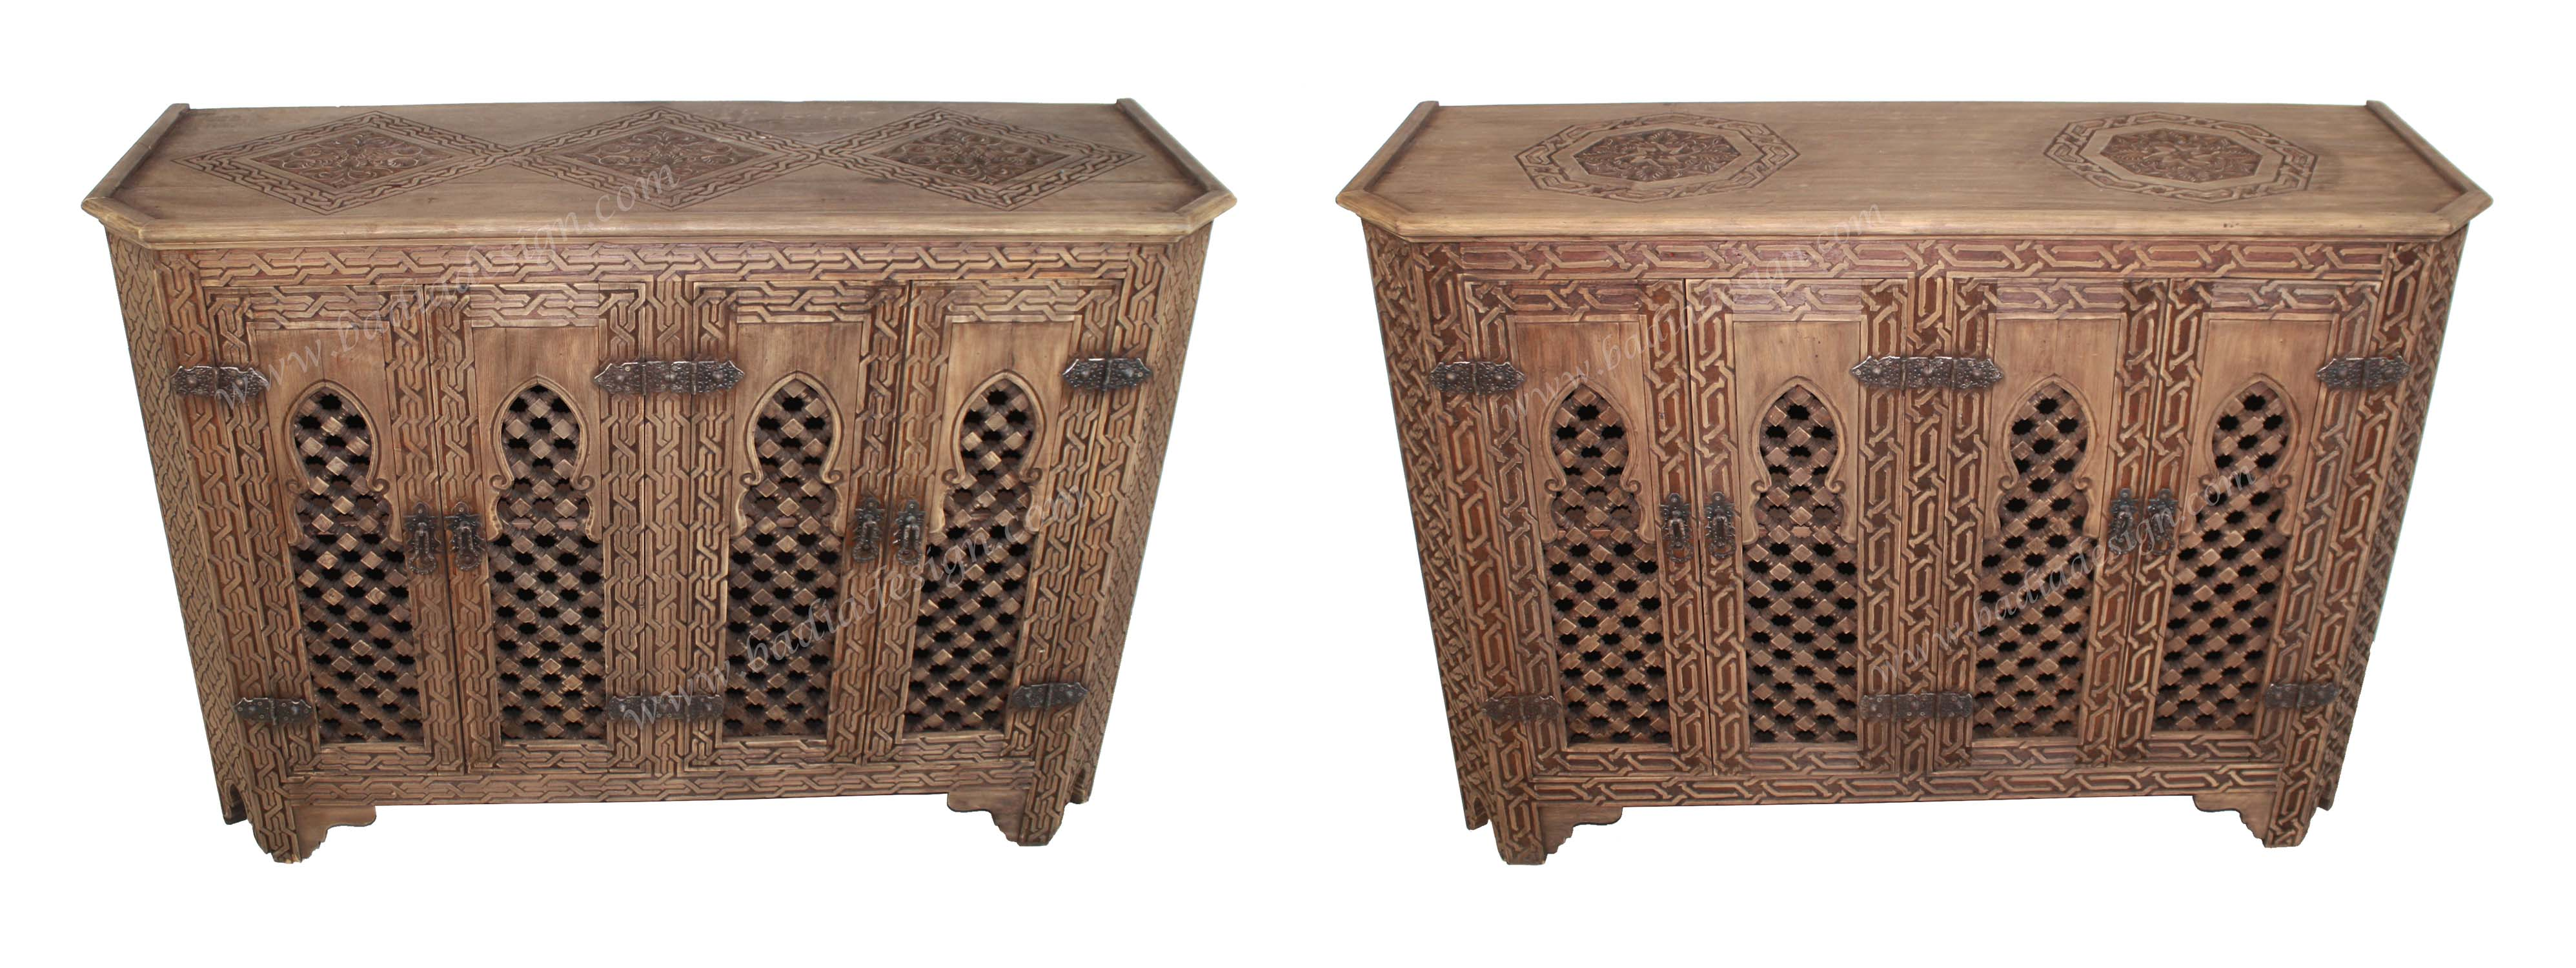 moroccan-cabinet-furniture-cw-ca050.jpg